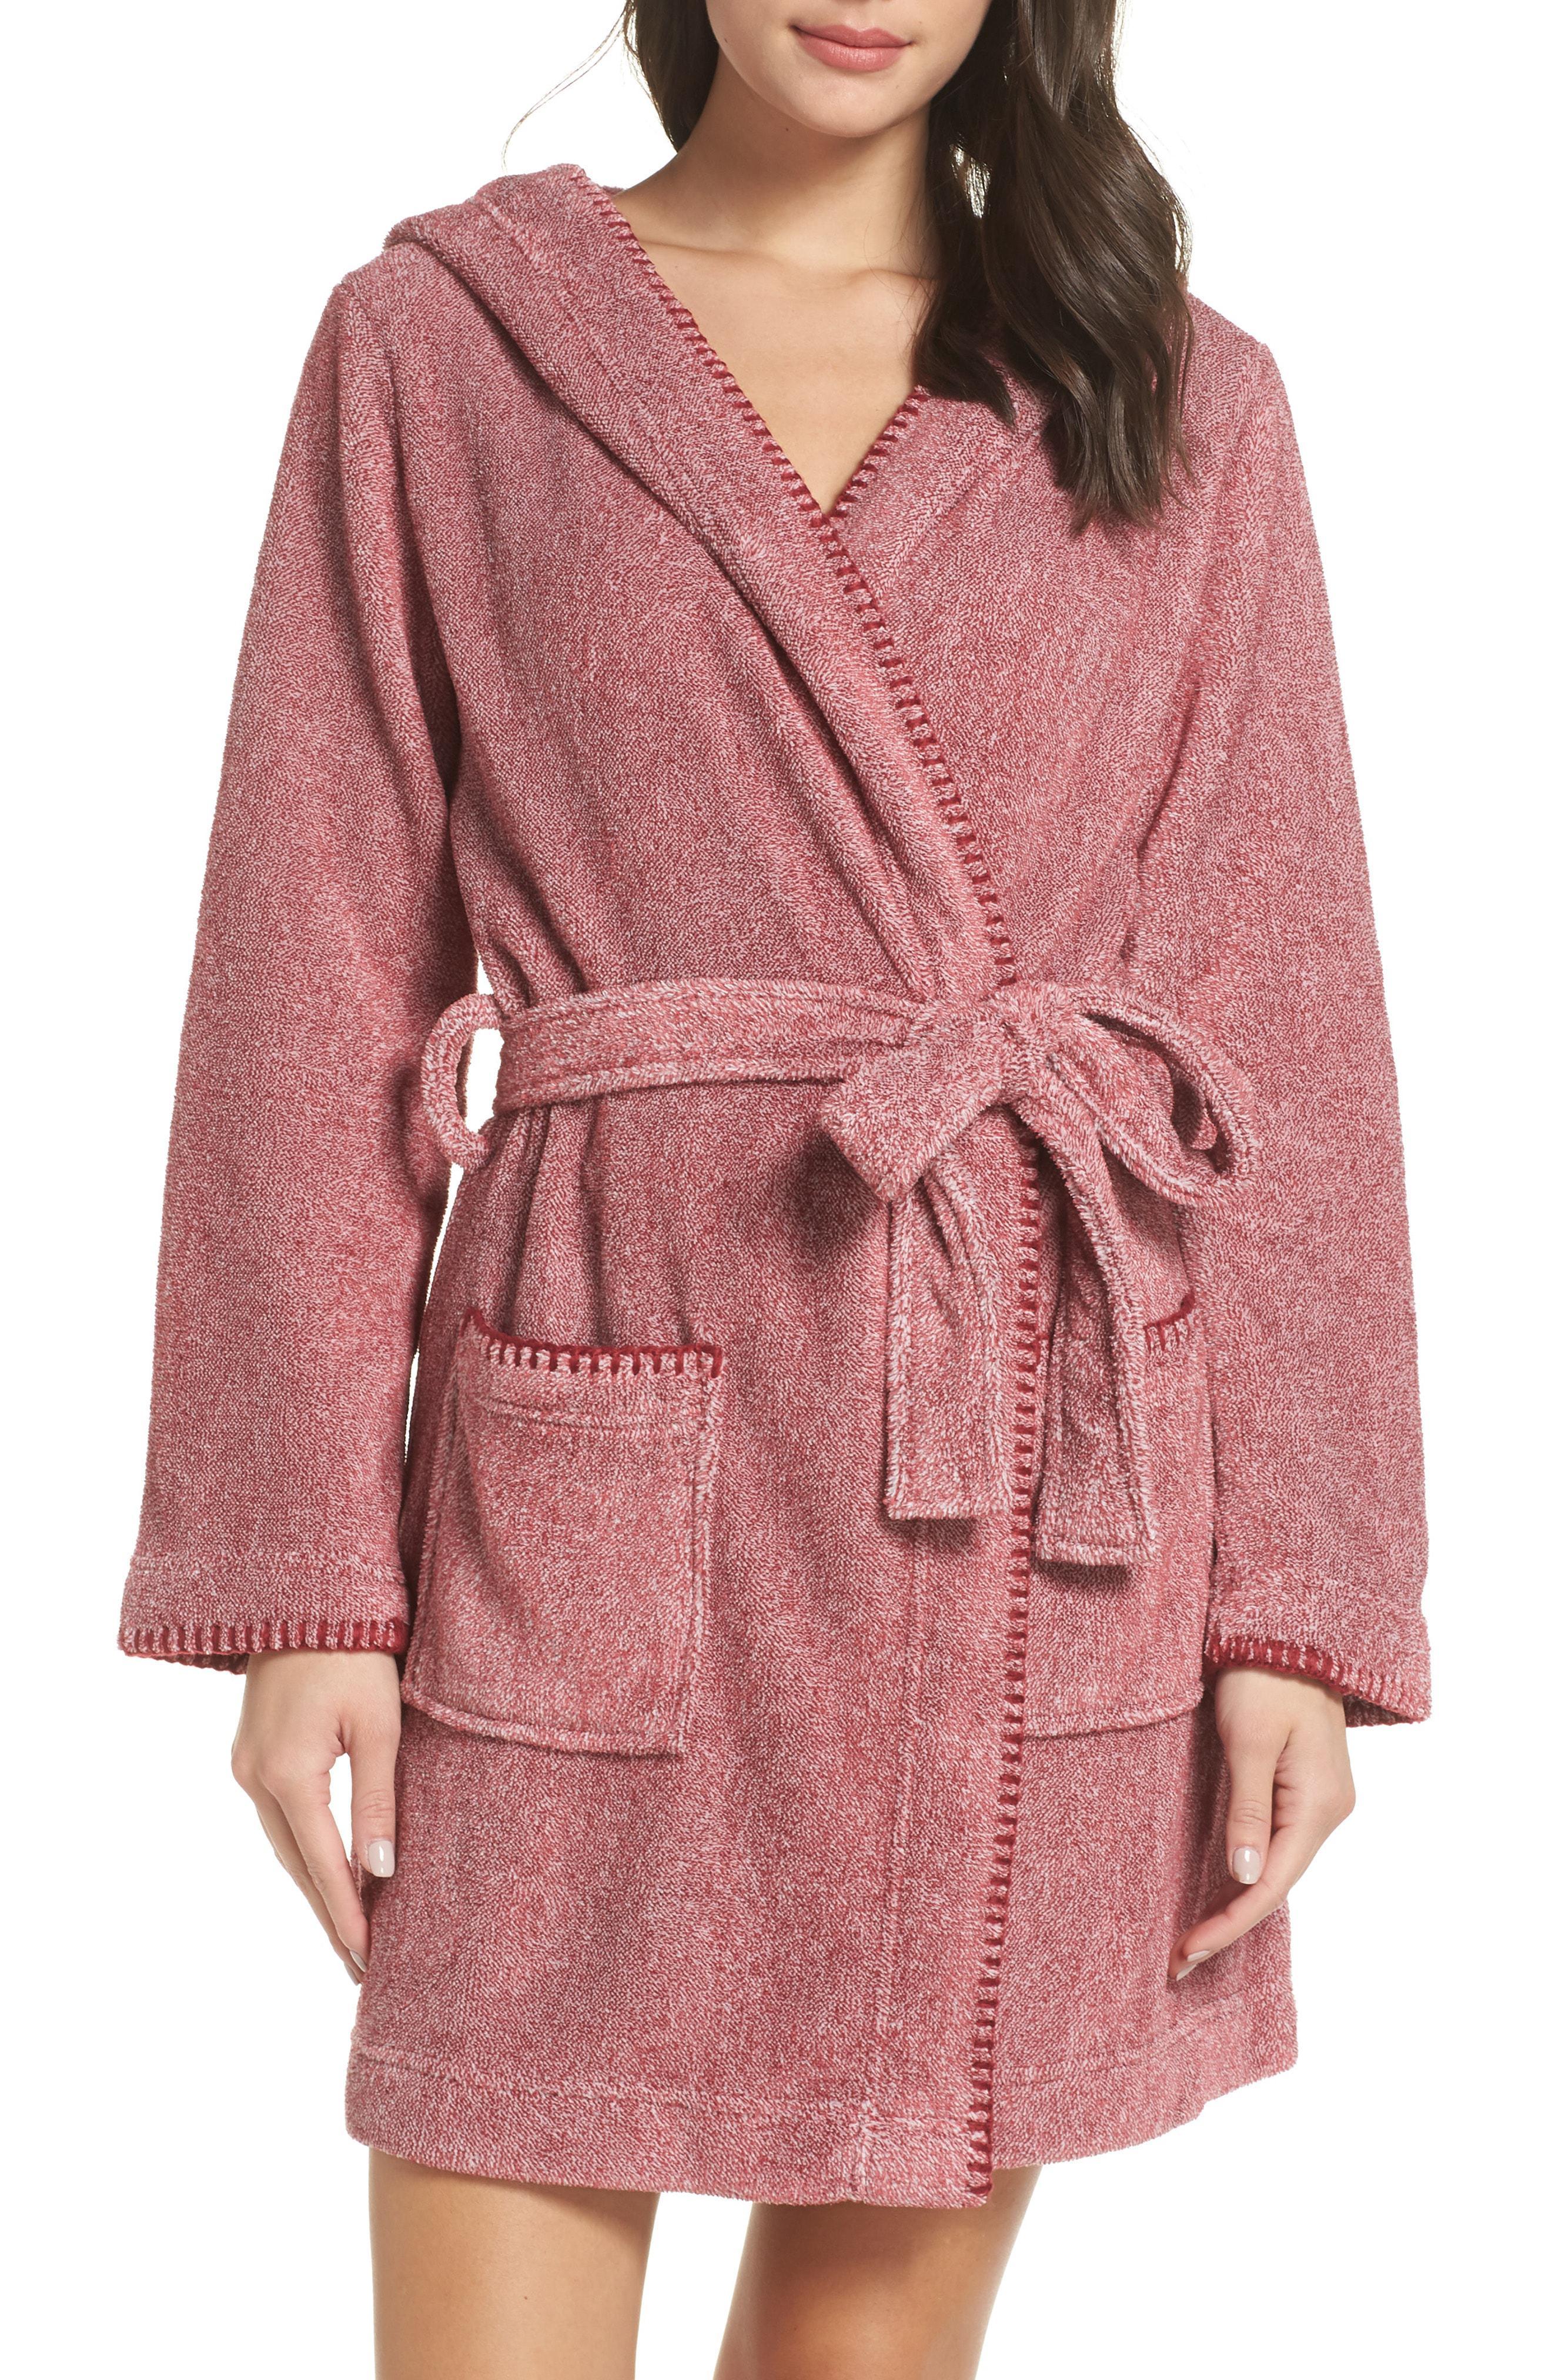 Womens Make Model Starry Night Plush Short Robe, Size XX-Small - Burgundy